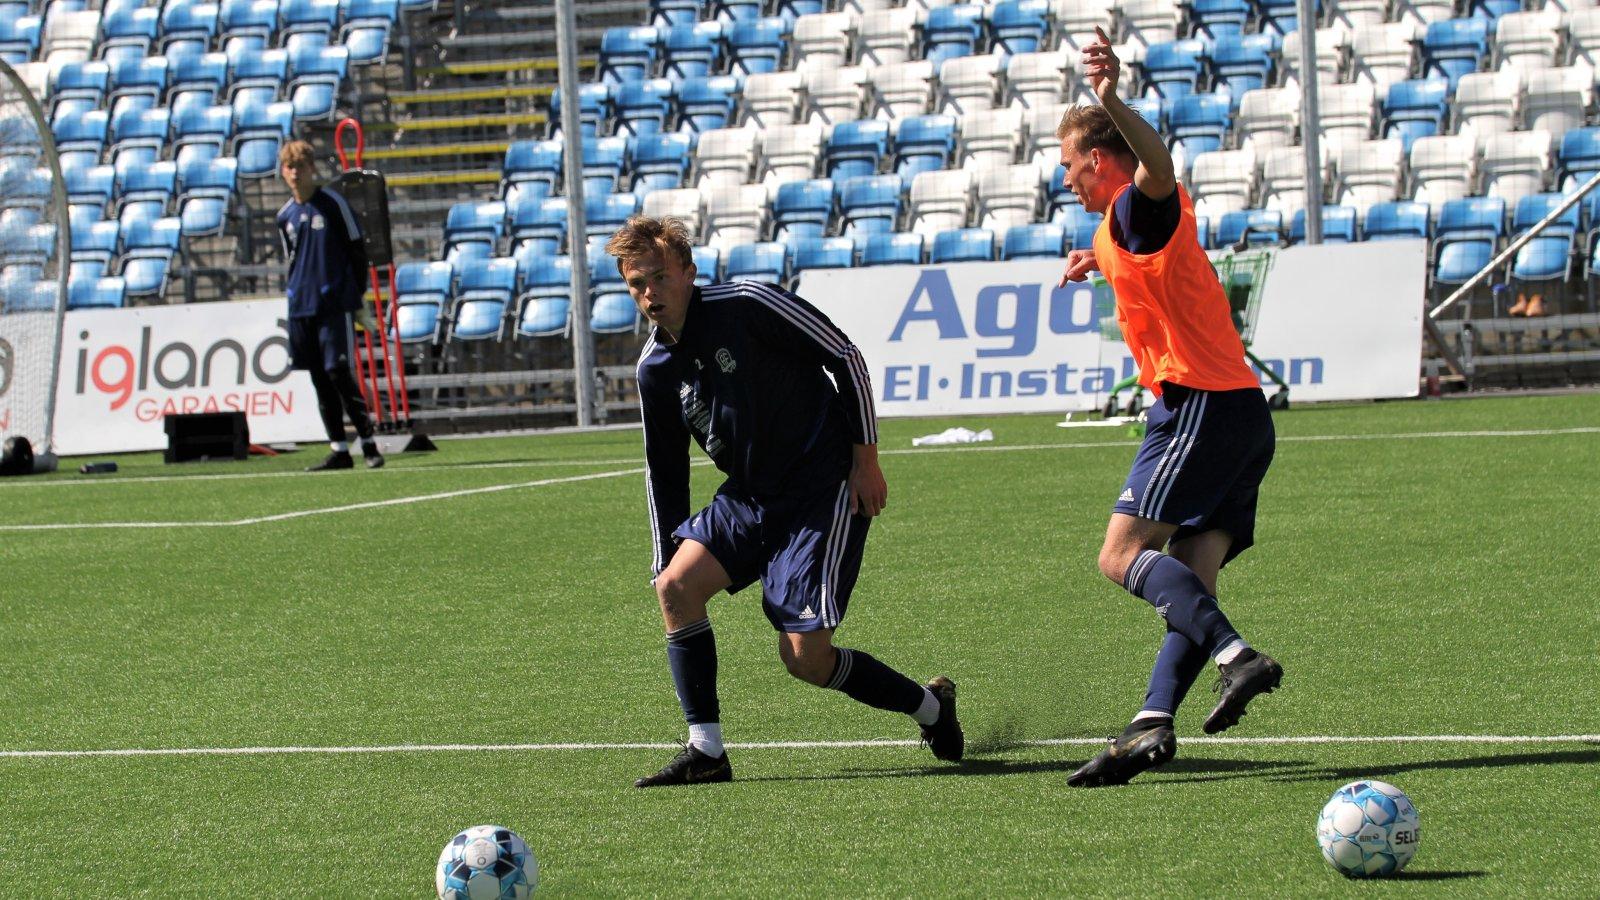 Peter Reinhardsen i duell med Kristian Eriksen på trening 2. juli 2020.